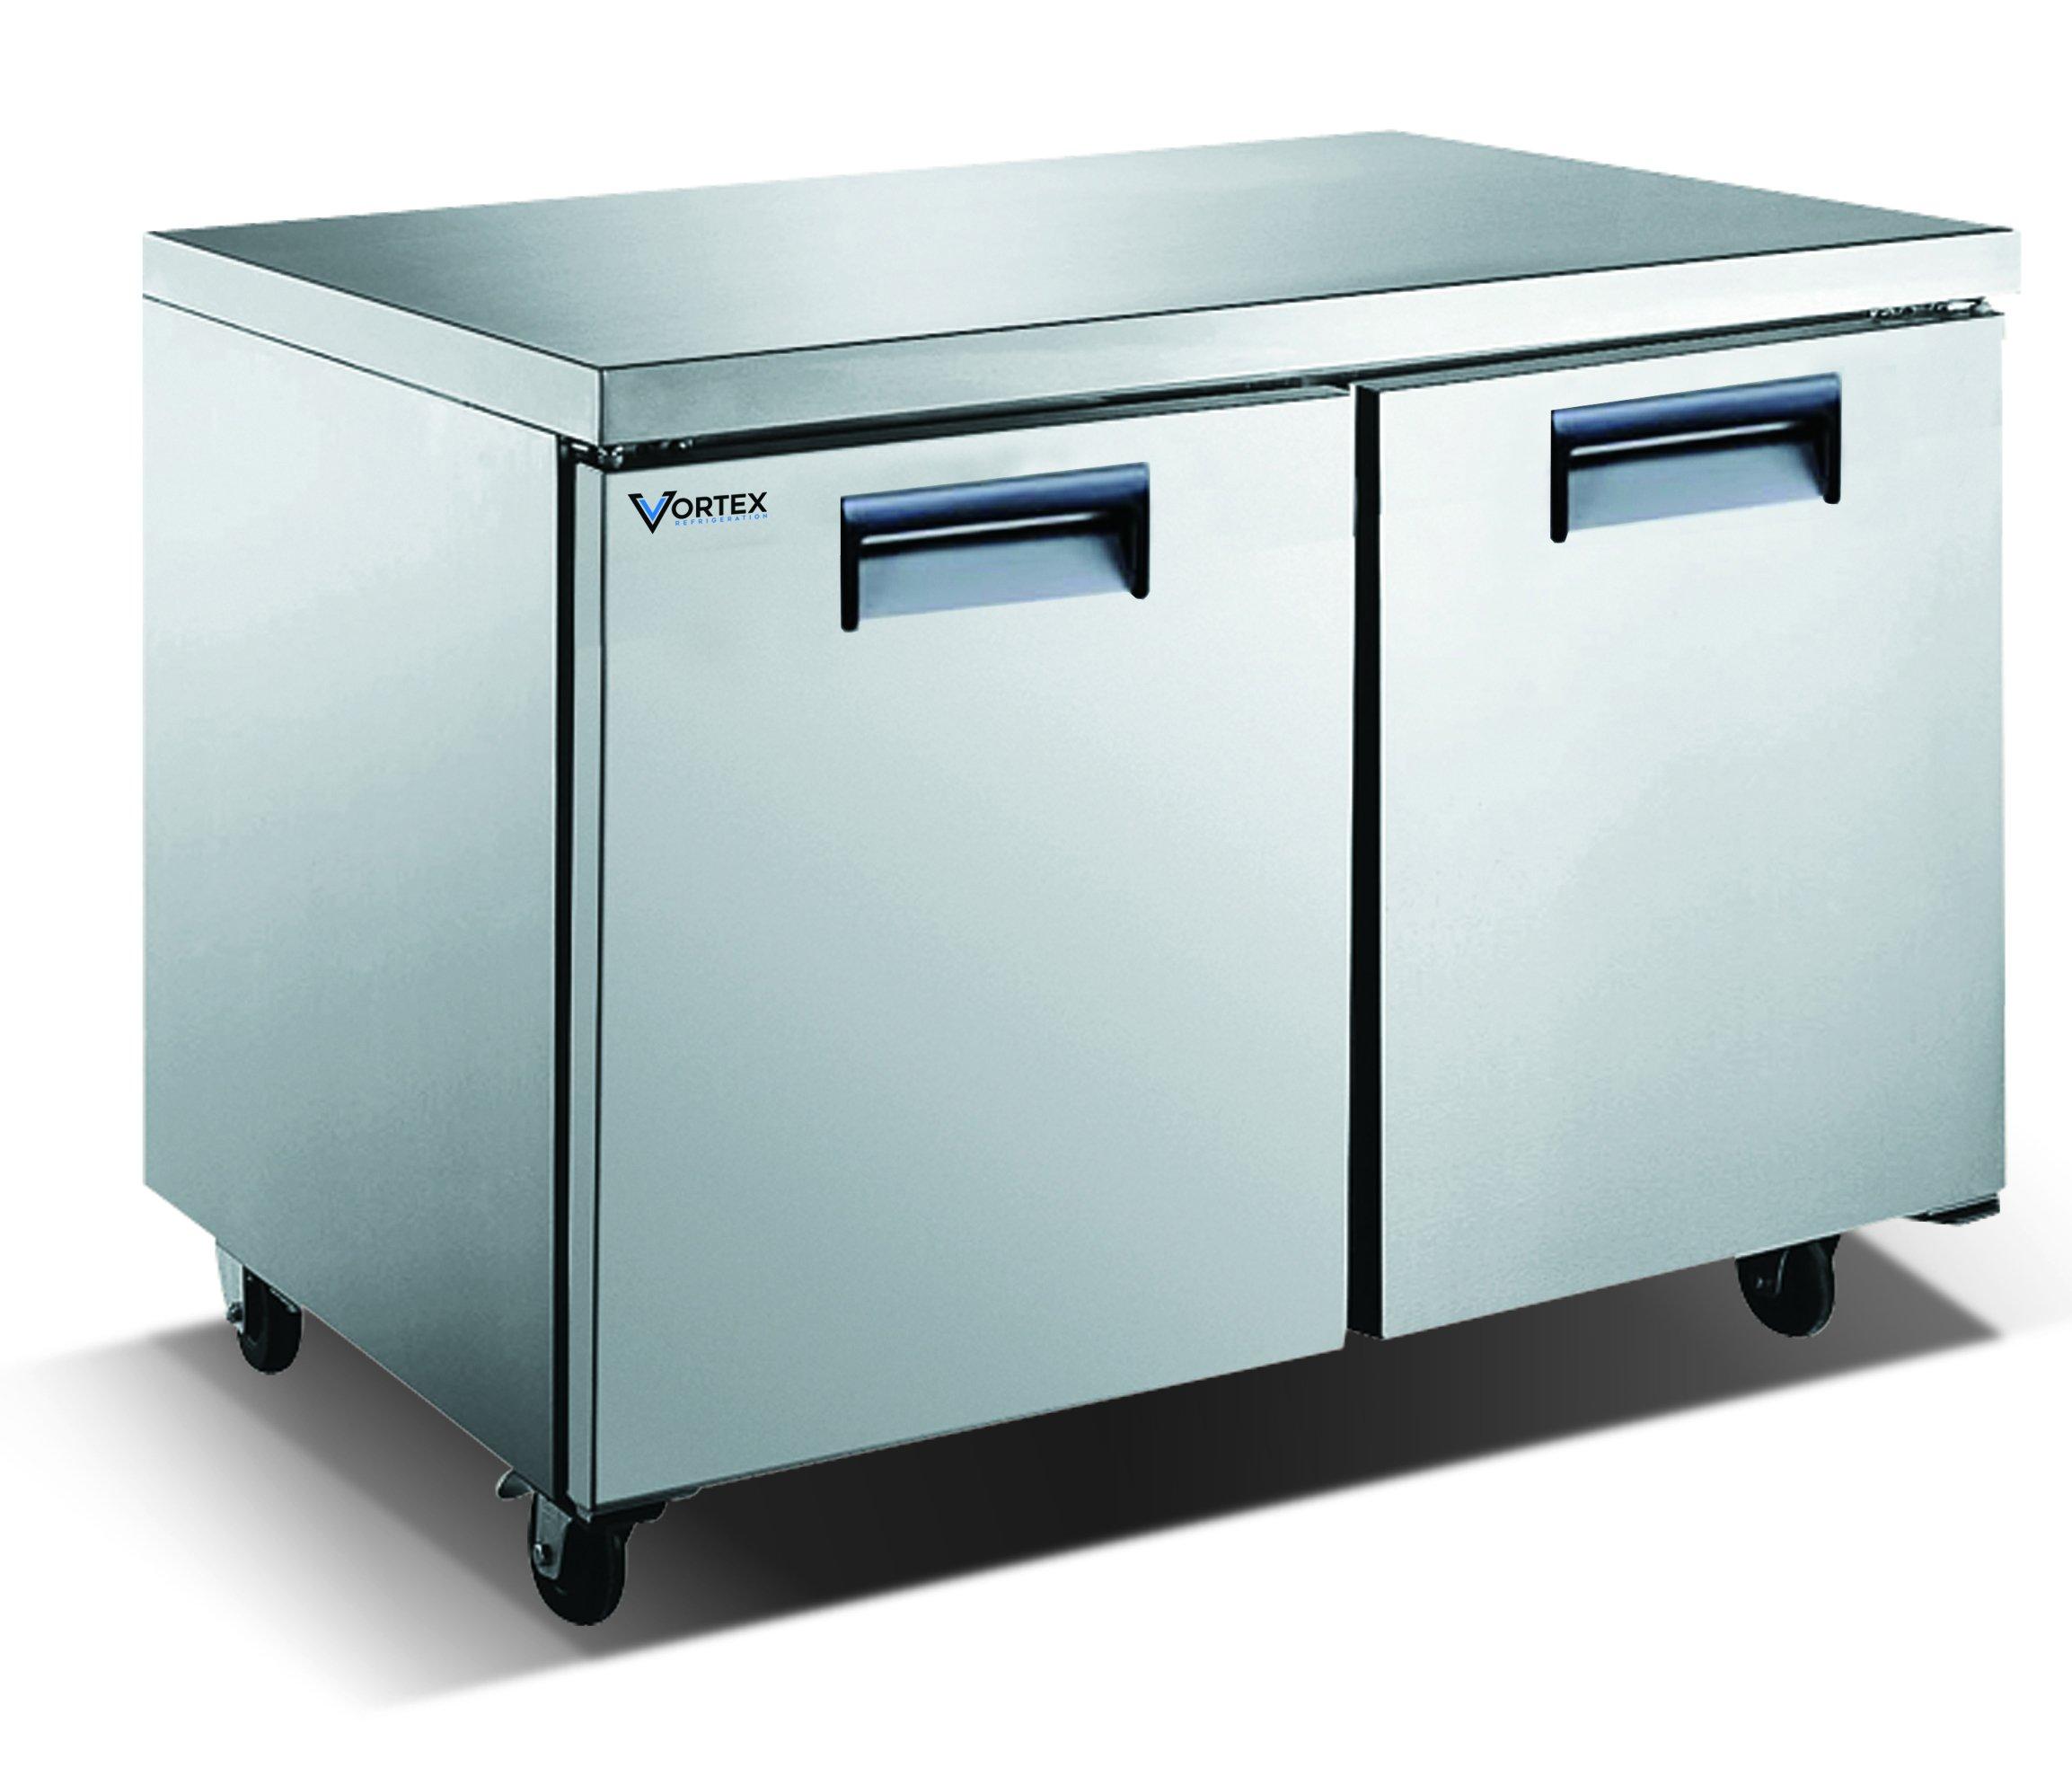 Vortex Refrigeration Commercial 2 Door 60'' Under Counter Refrigerator - 18 Cu. Ft.